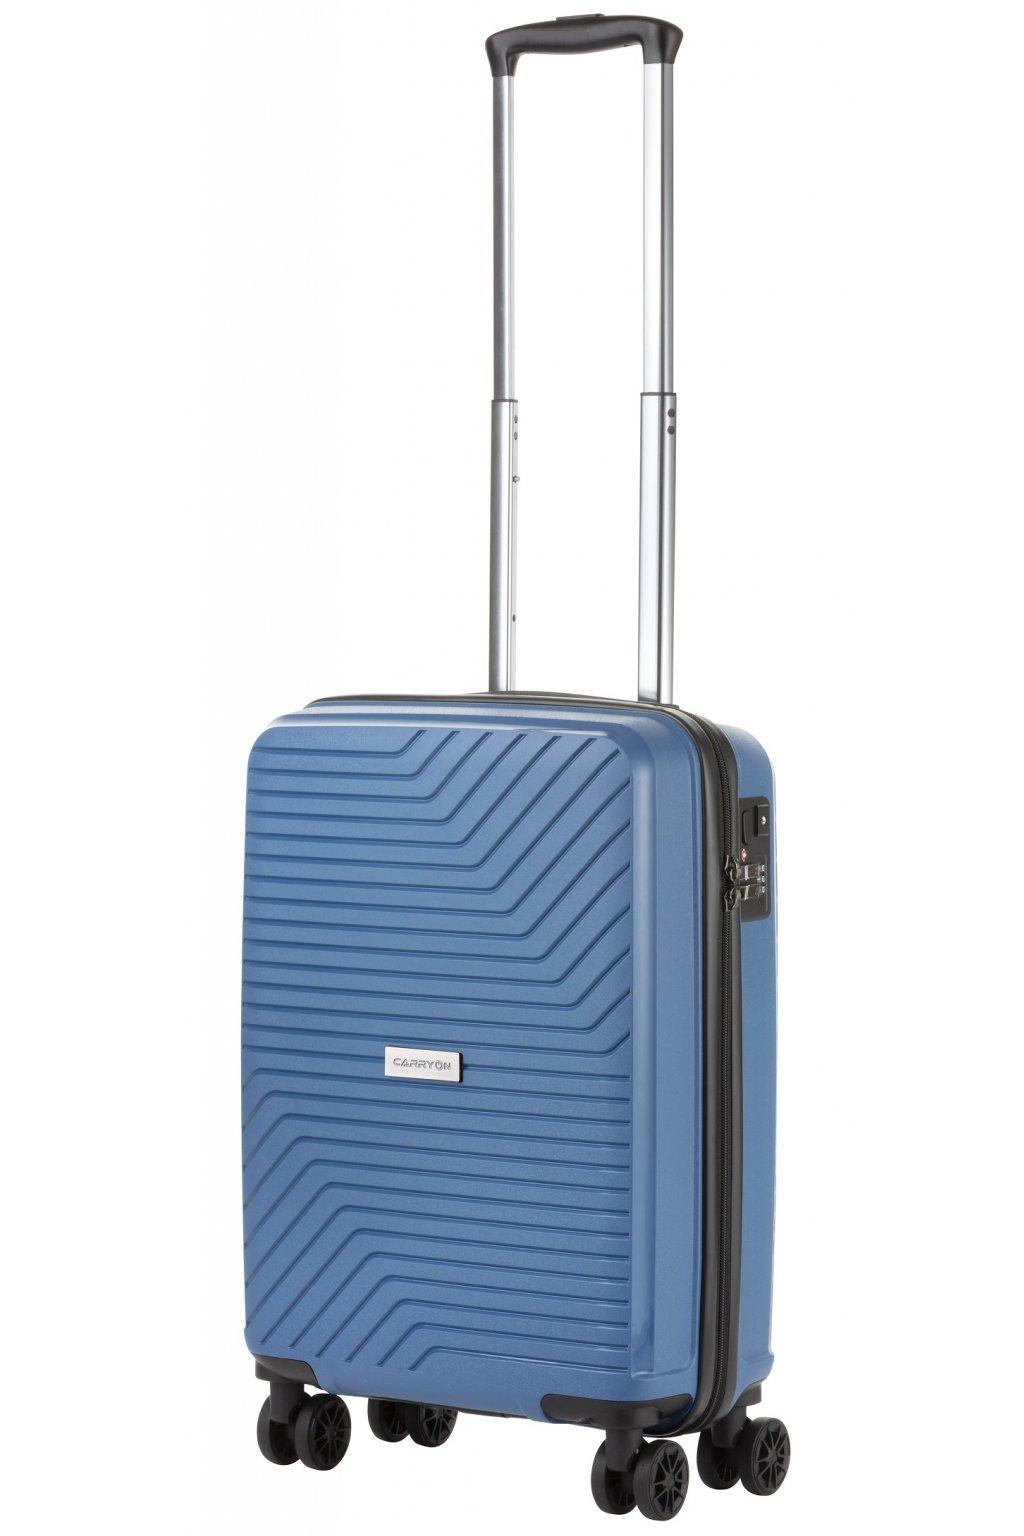 kufrland carryon transport blue (3)